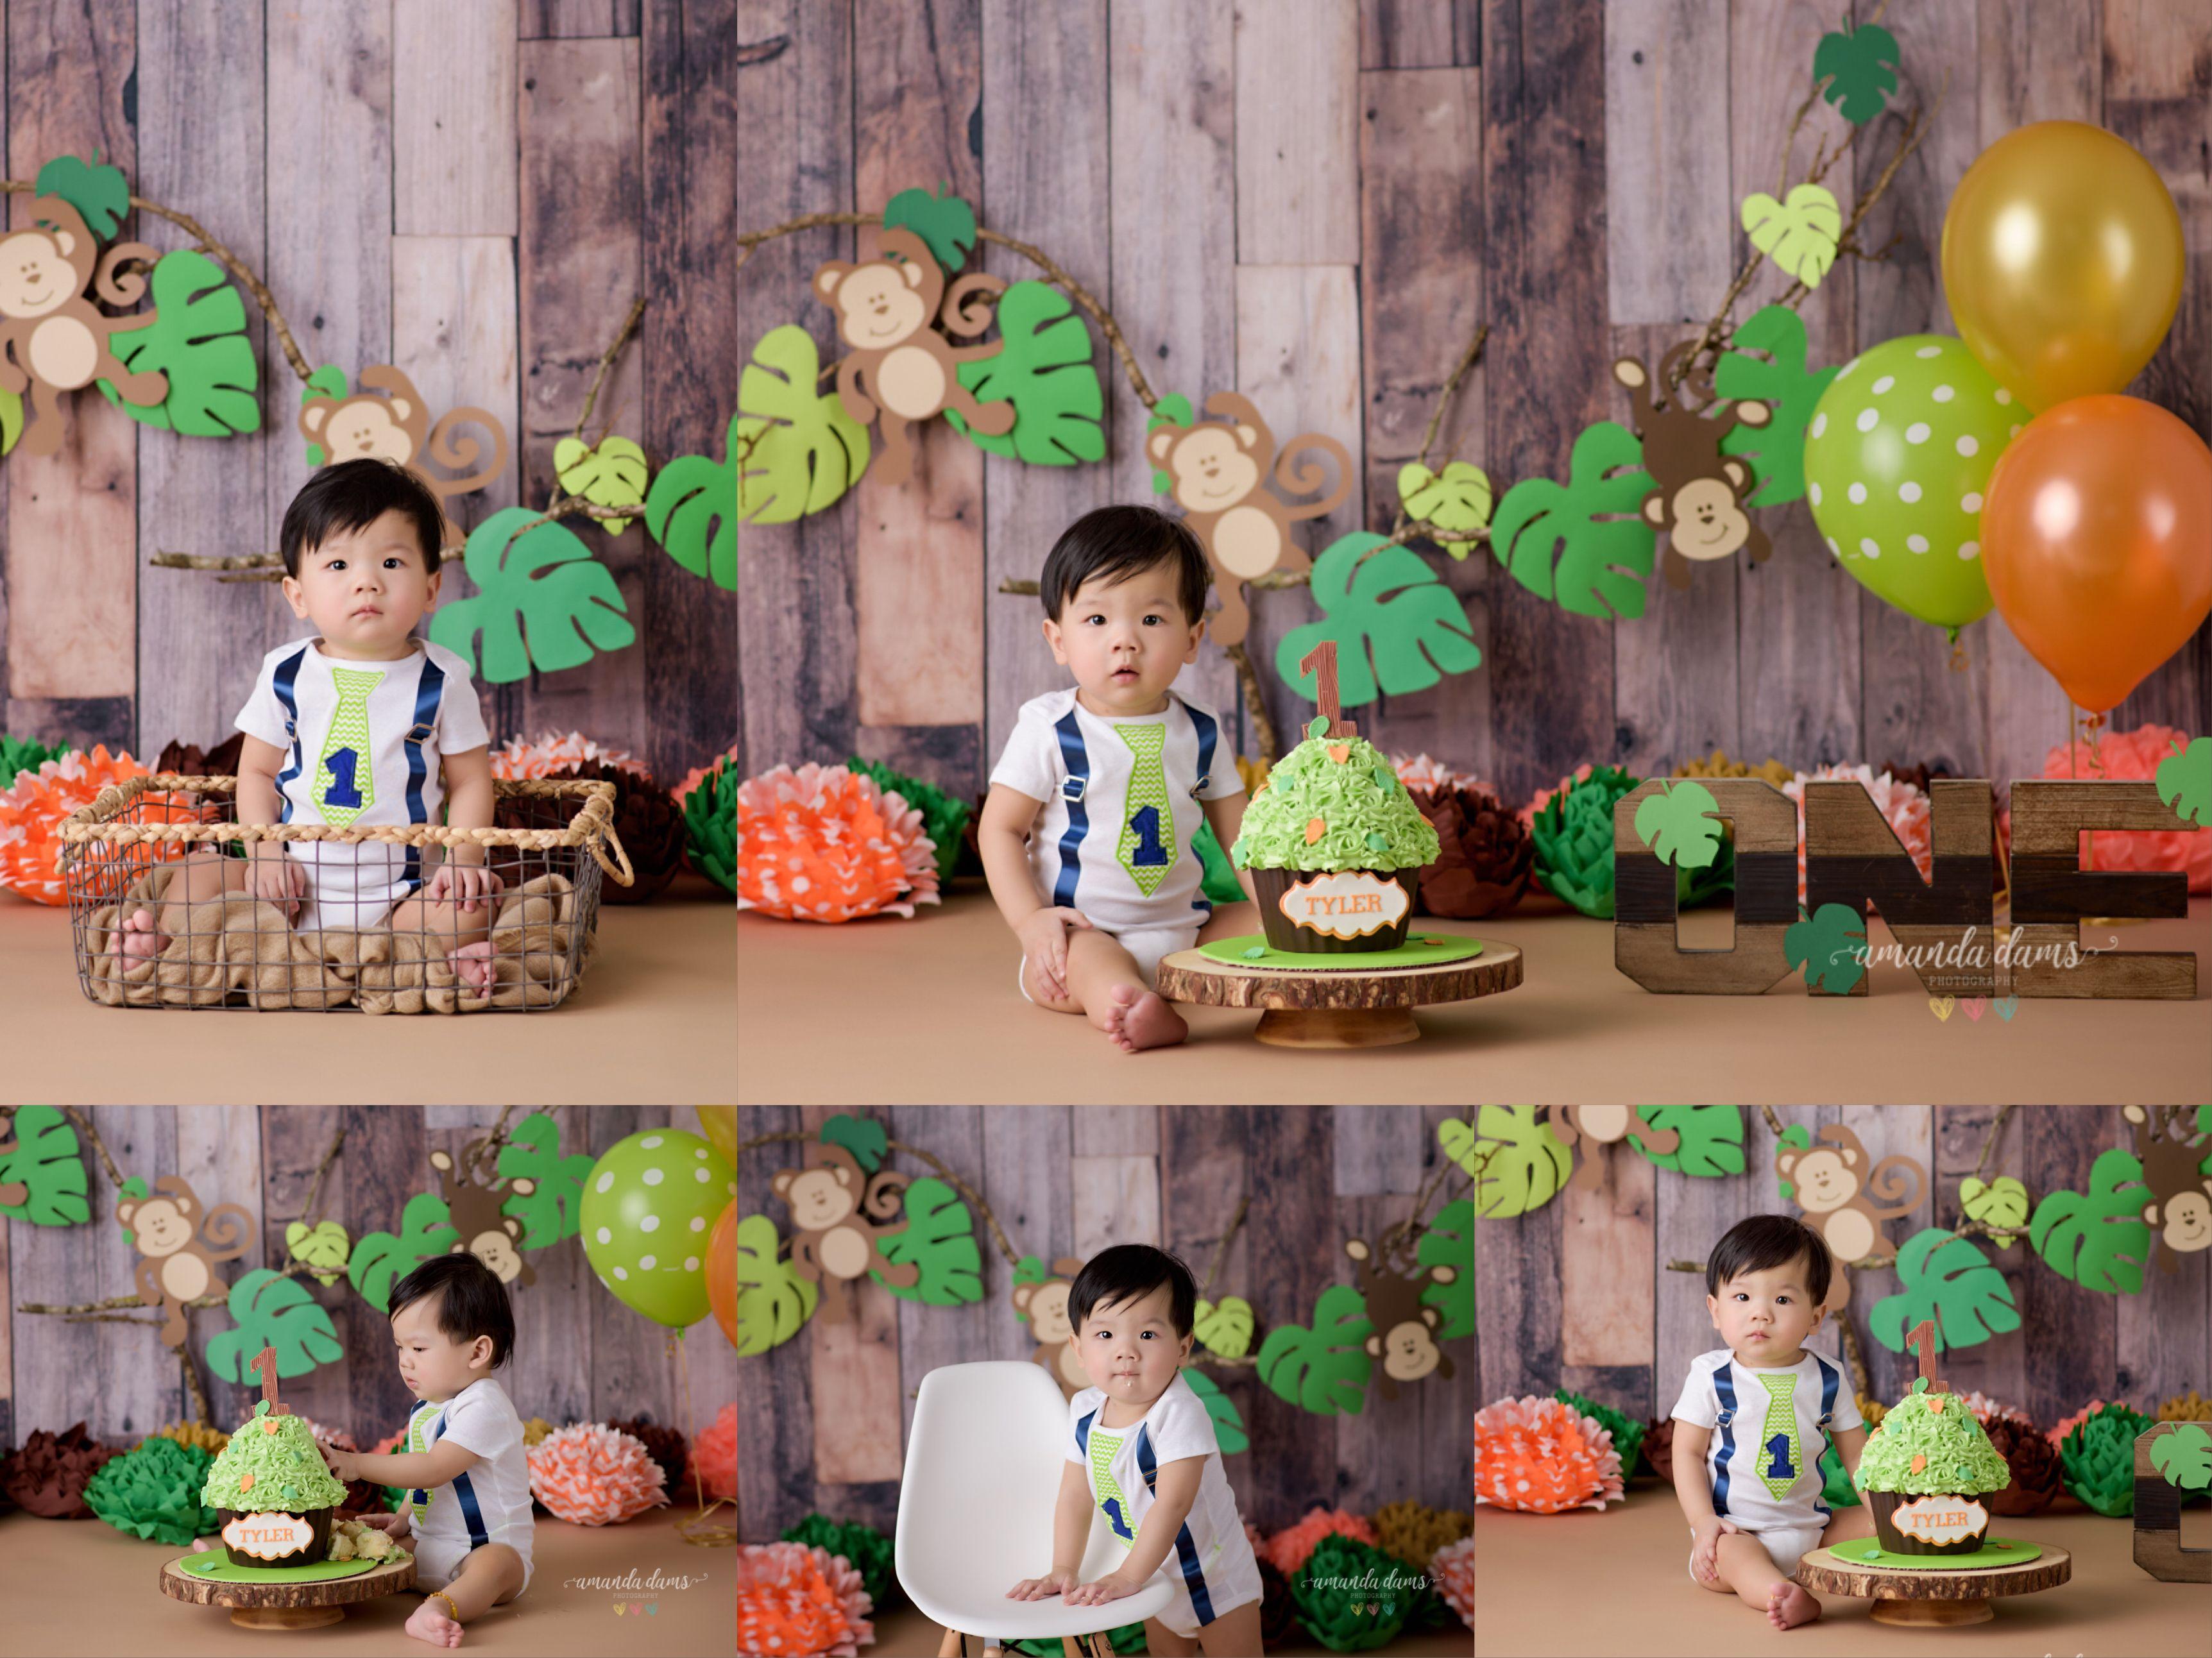 Cake Smash Inspiration Ideas For Boys Monkey Forest